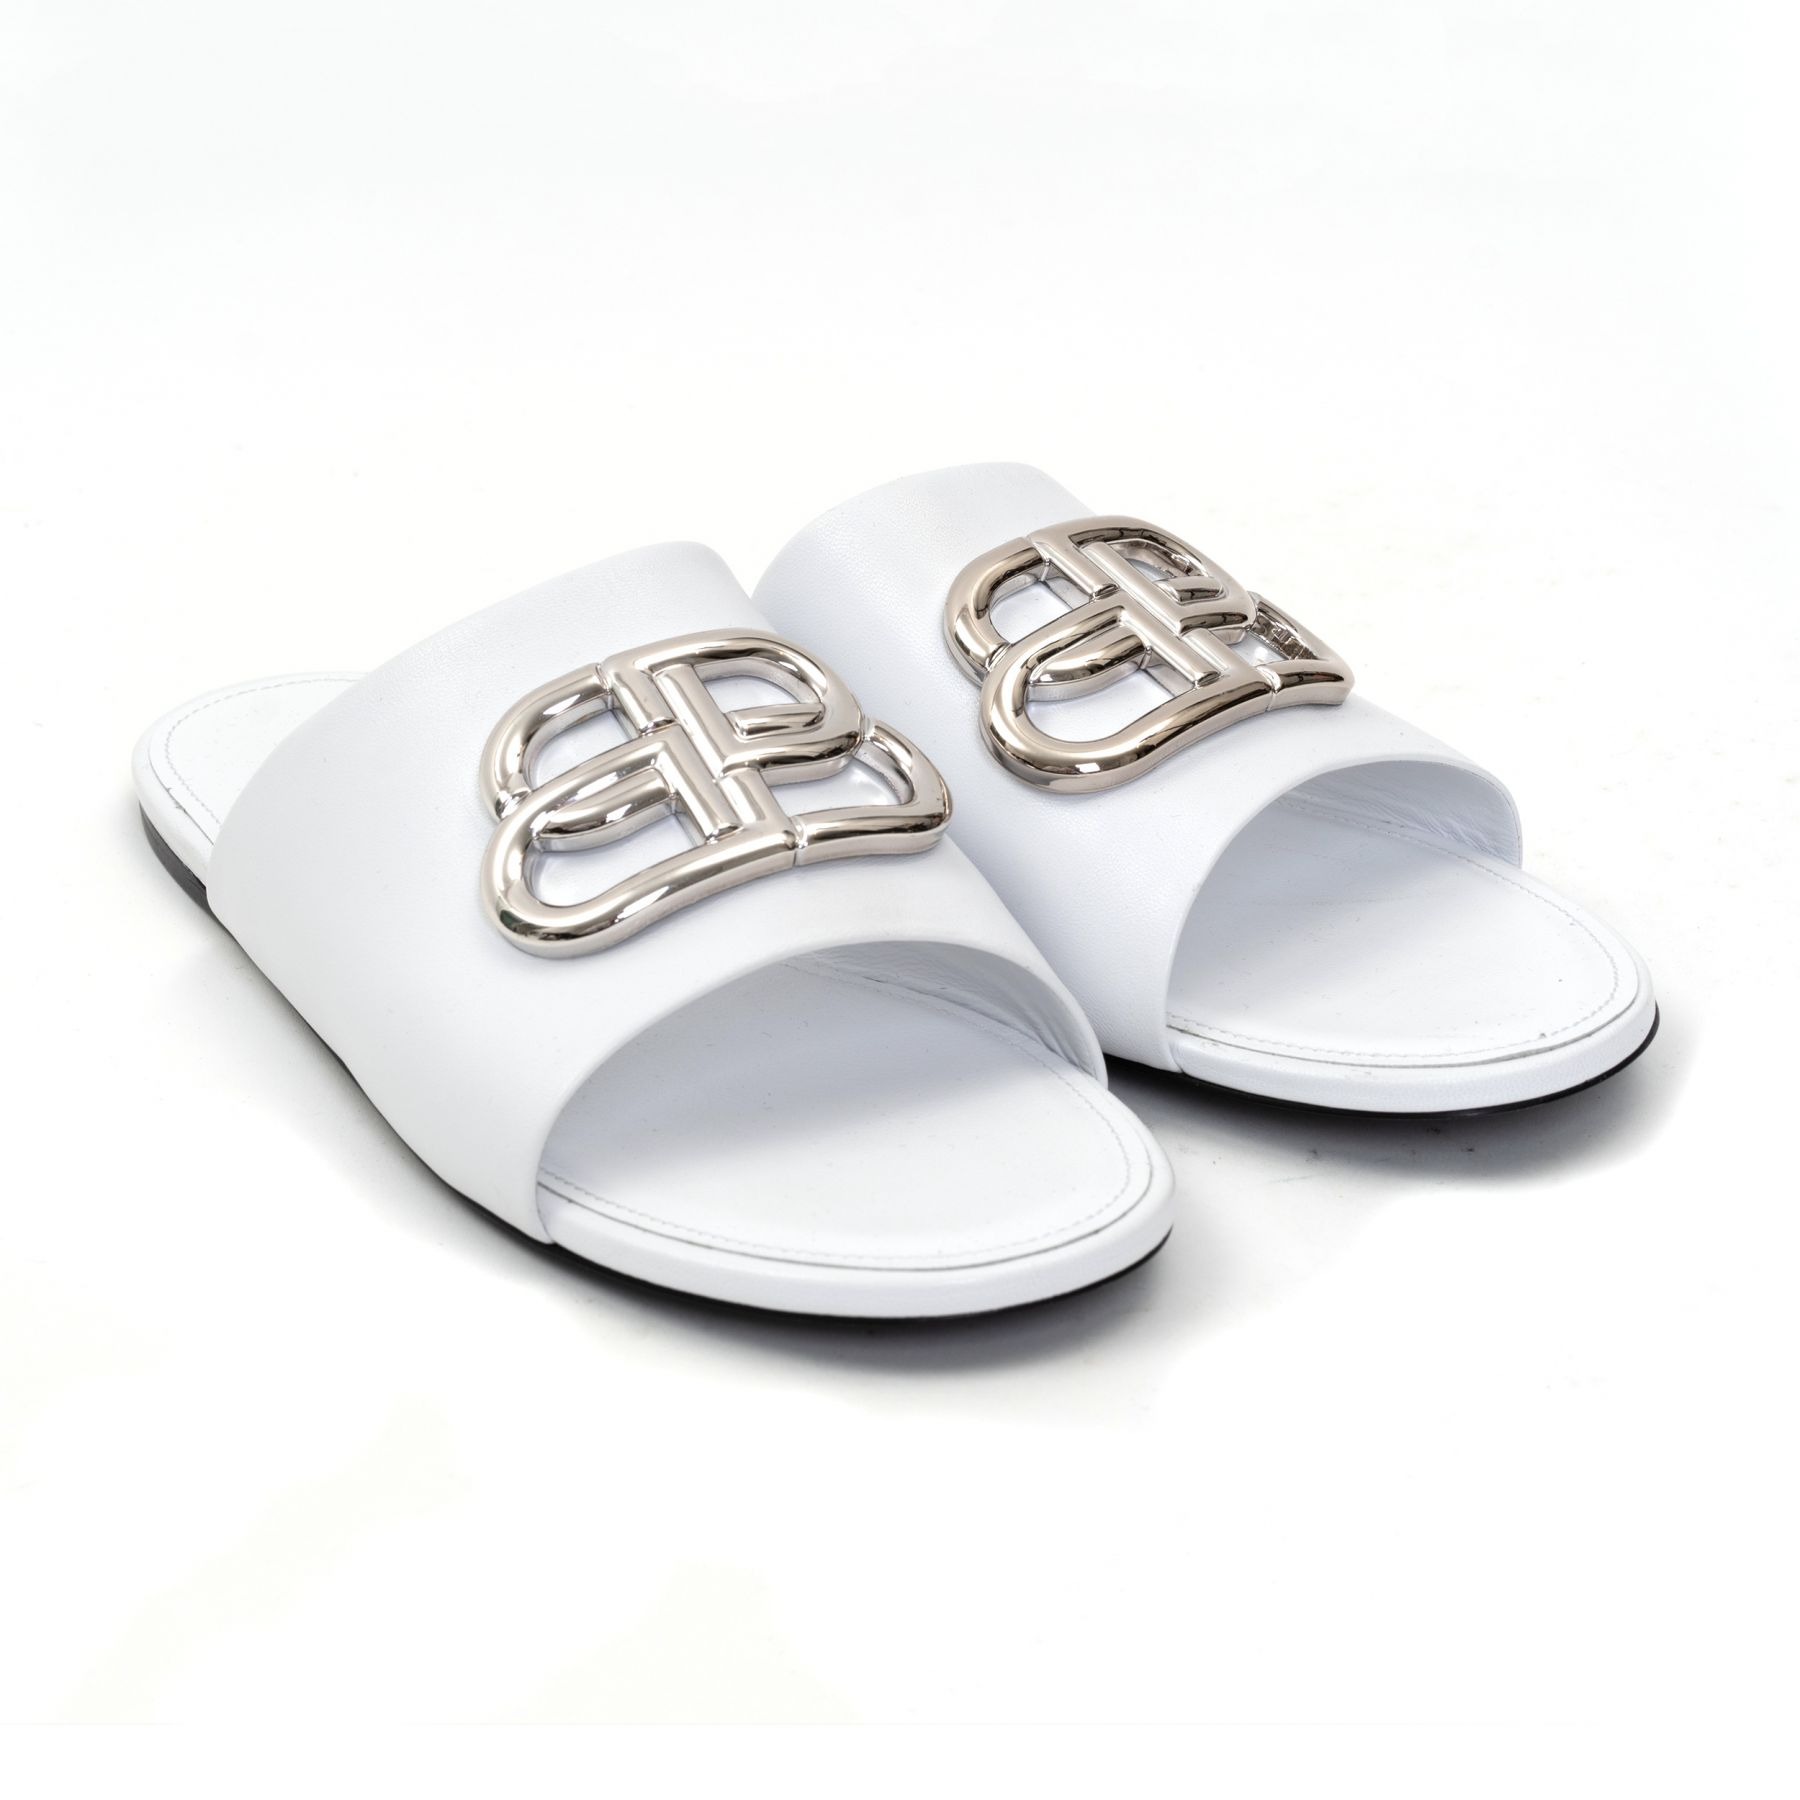 Босоножки Balenciaga бело-серебристые